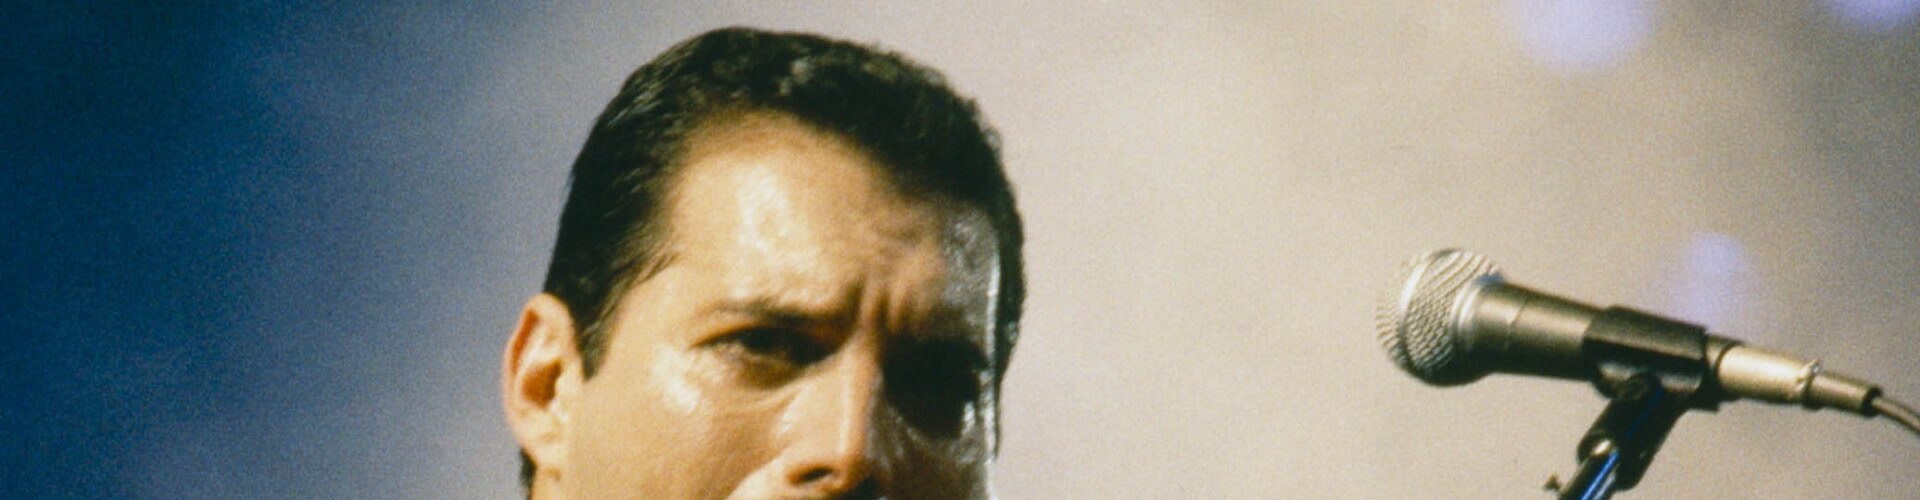 Watch Freddie Mercury: Tribute Concert Online